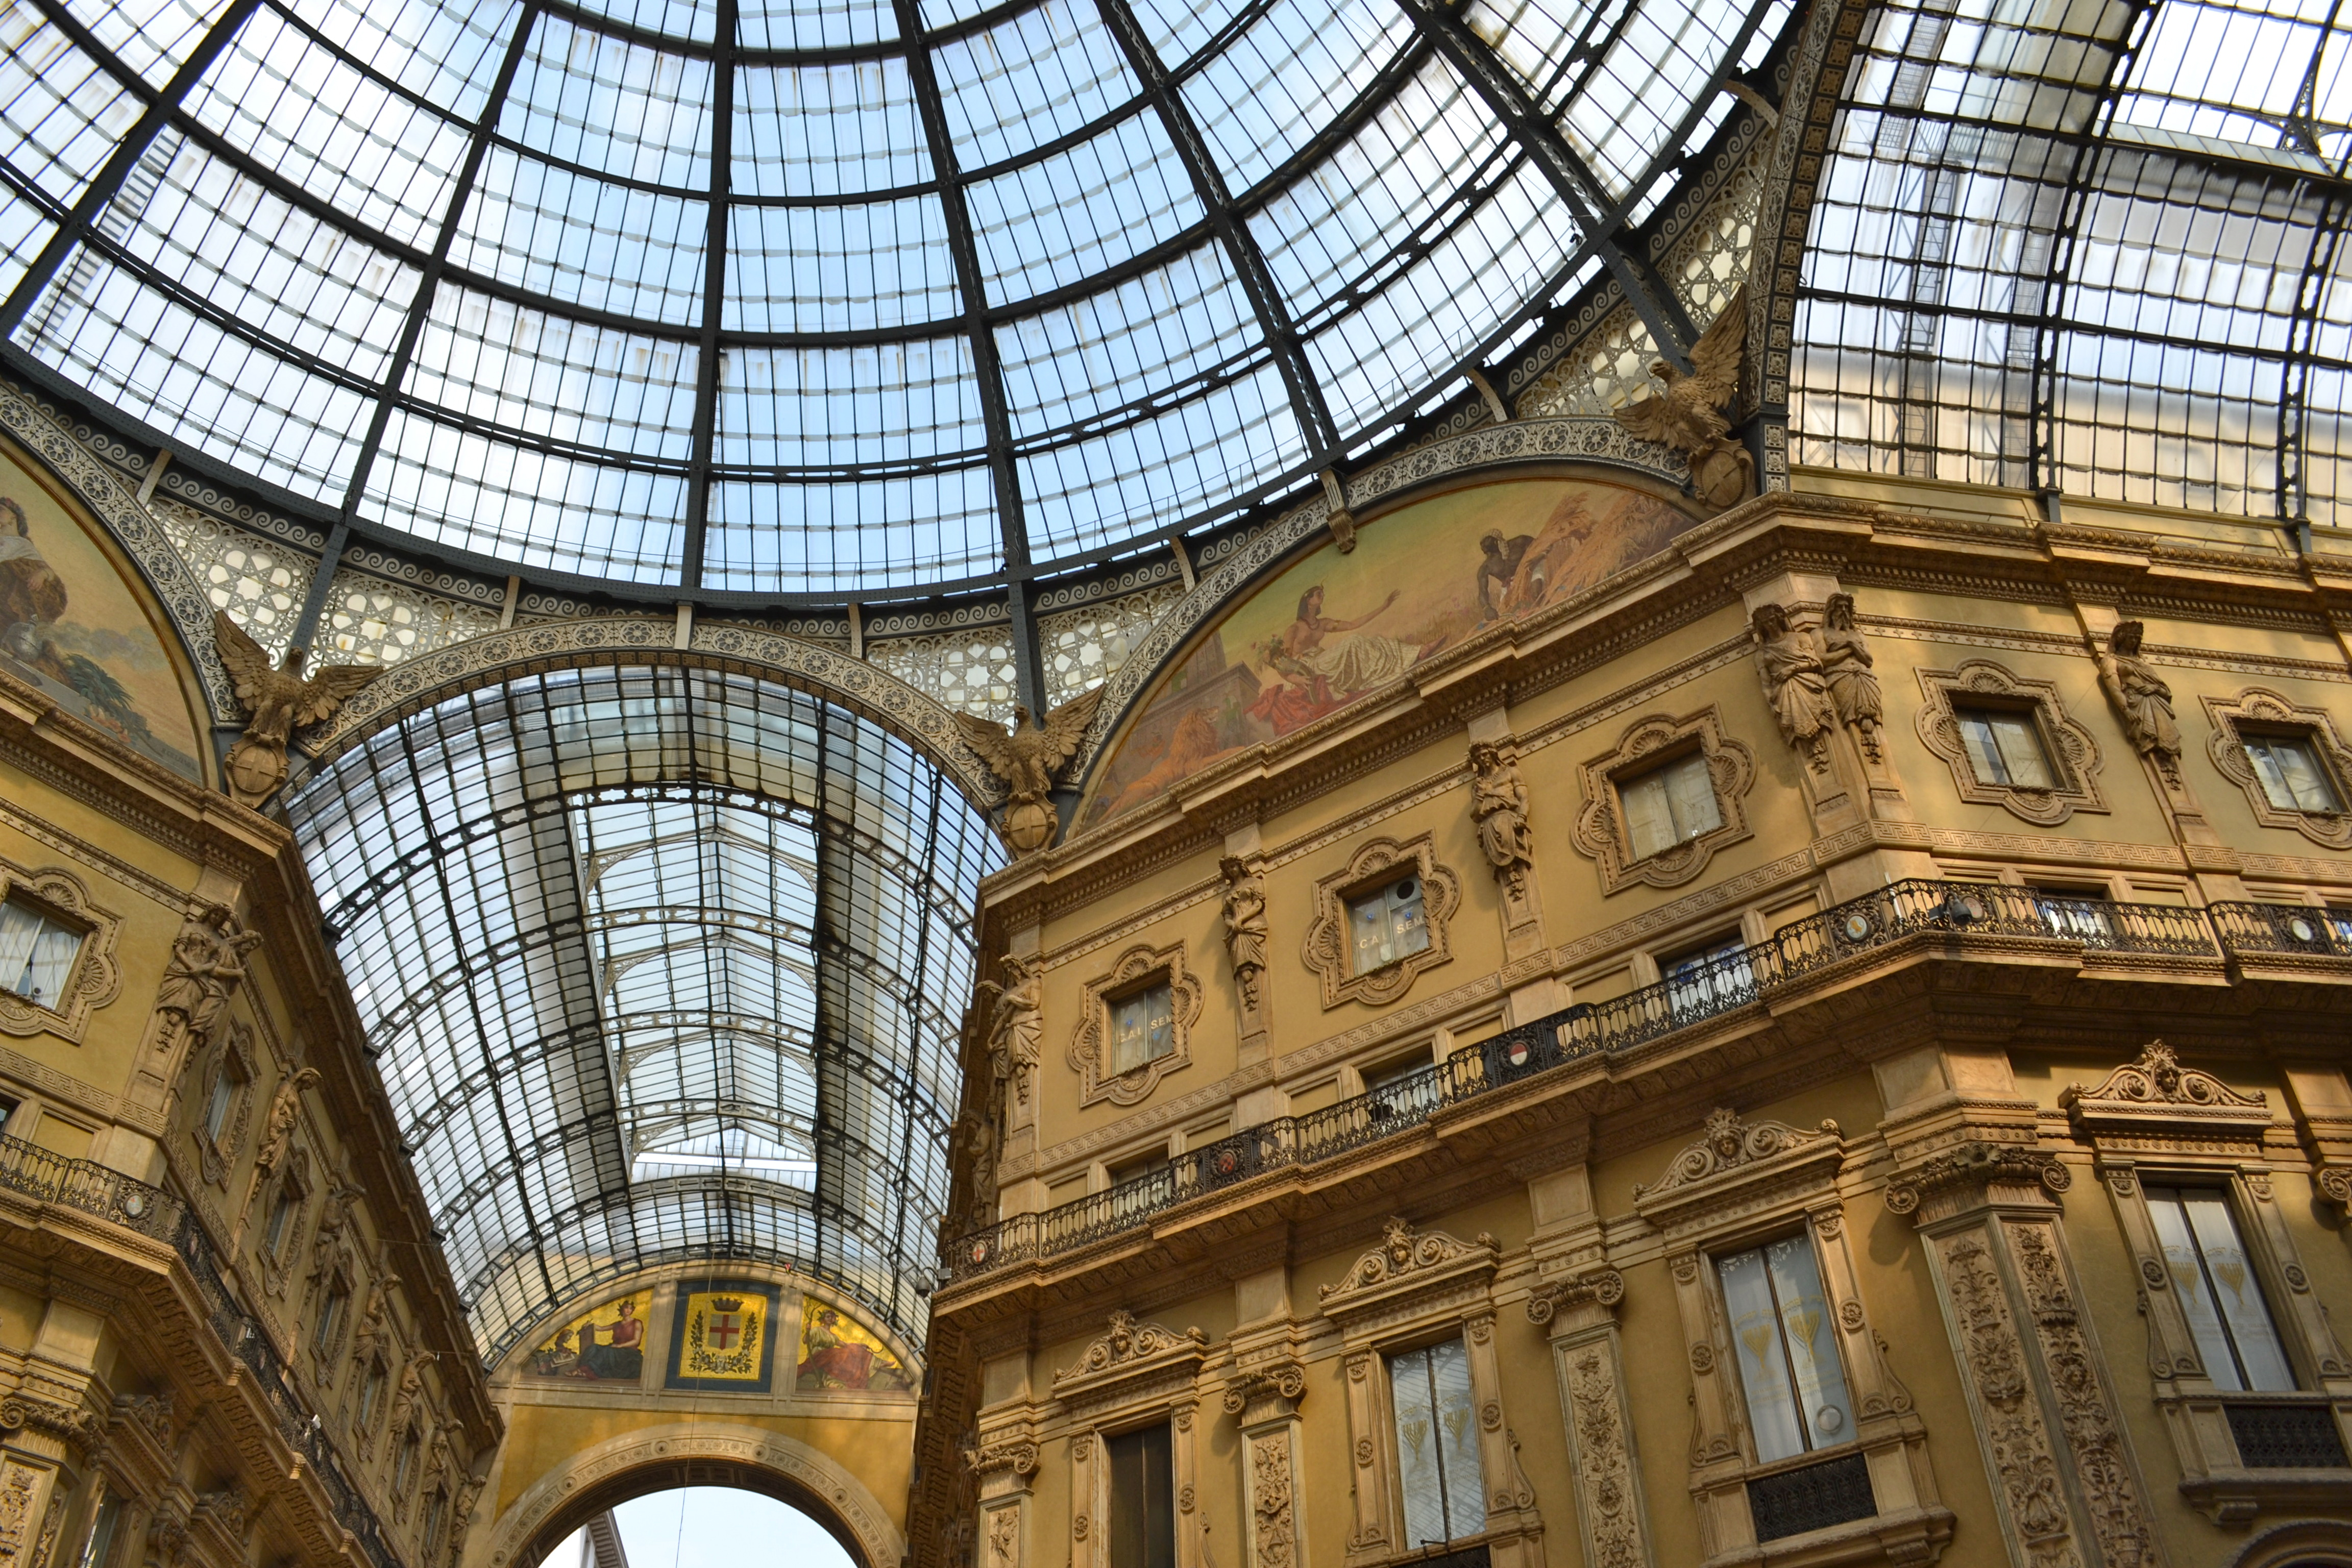 afd231499e9 La Galleria Vittorio Emanuele II